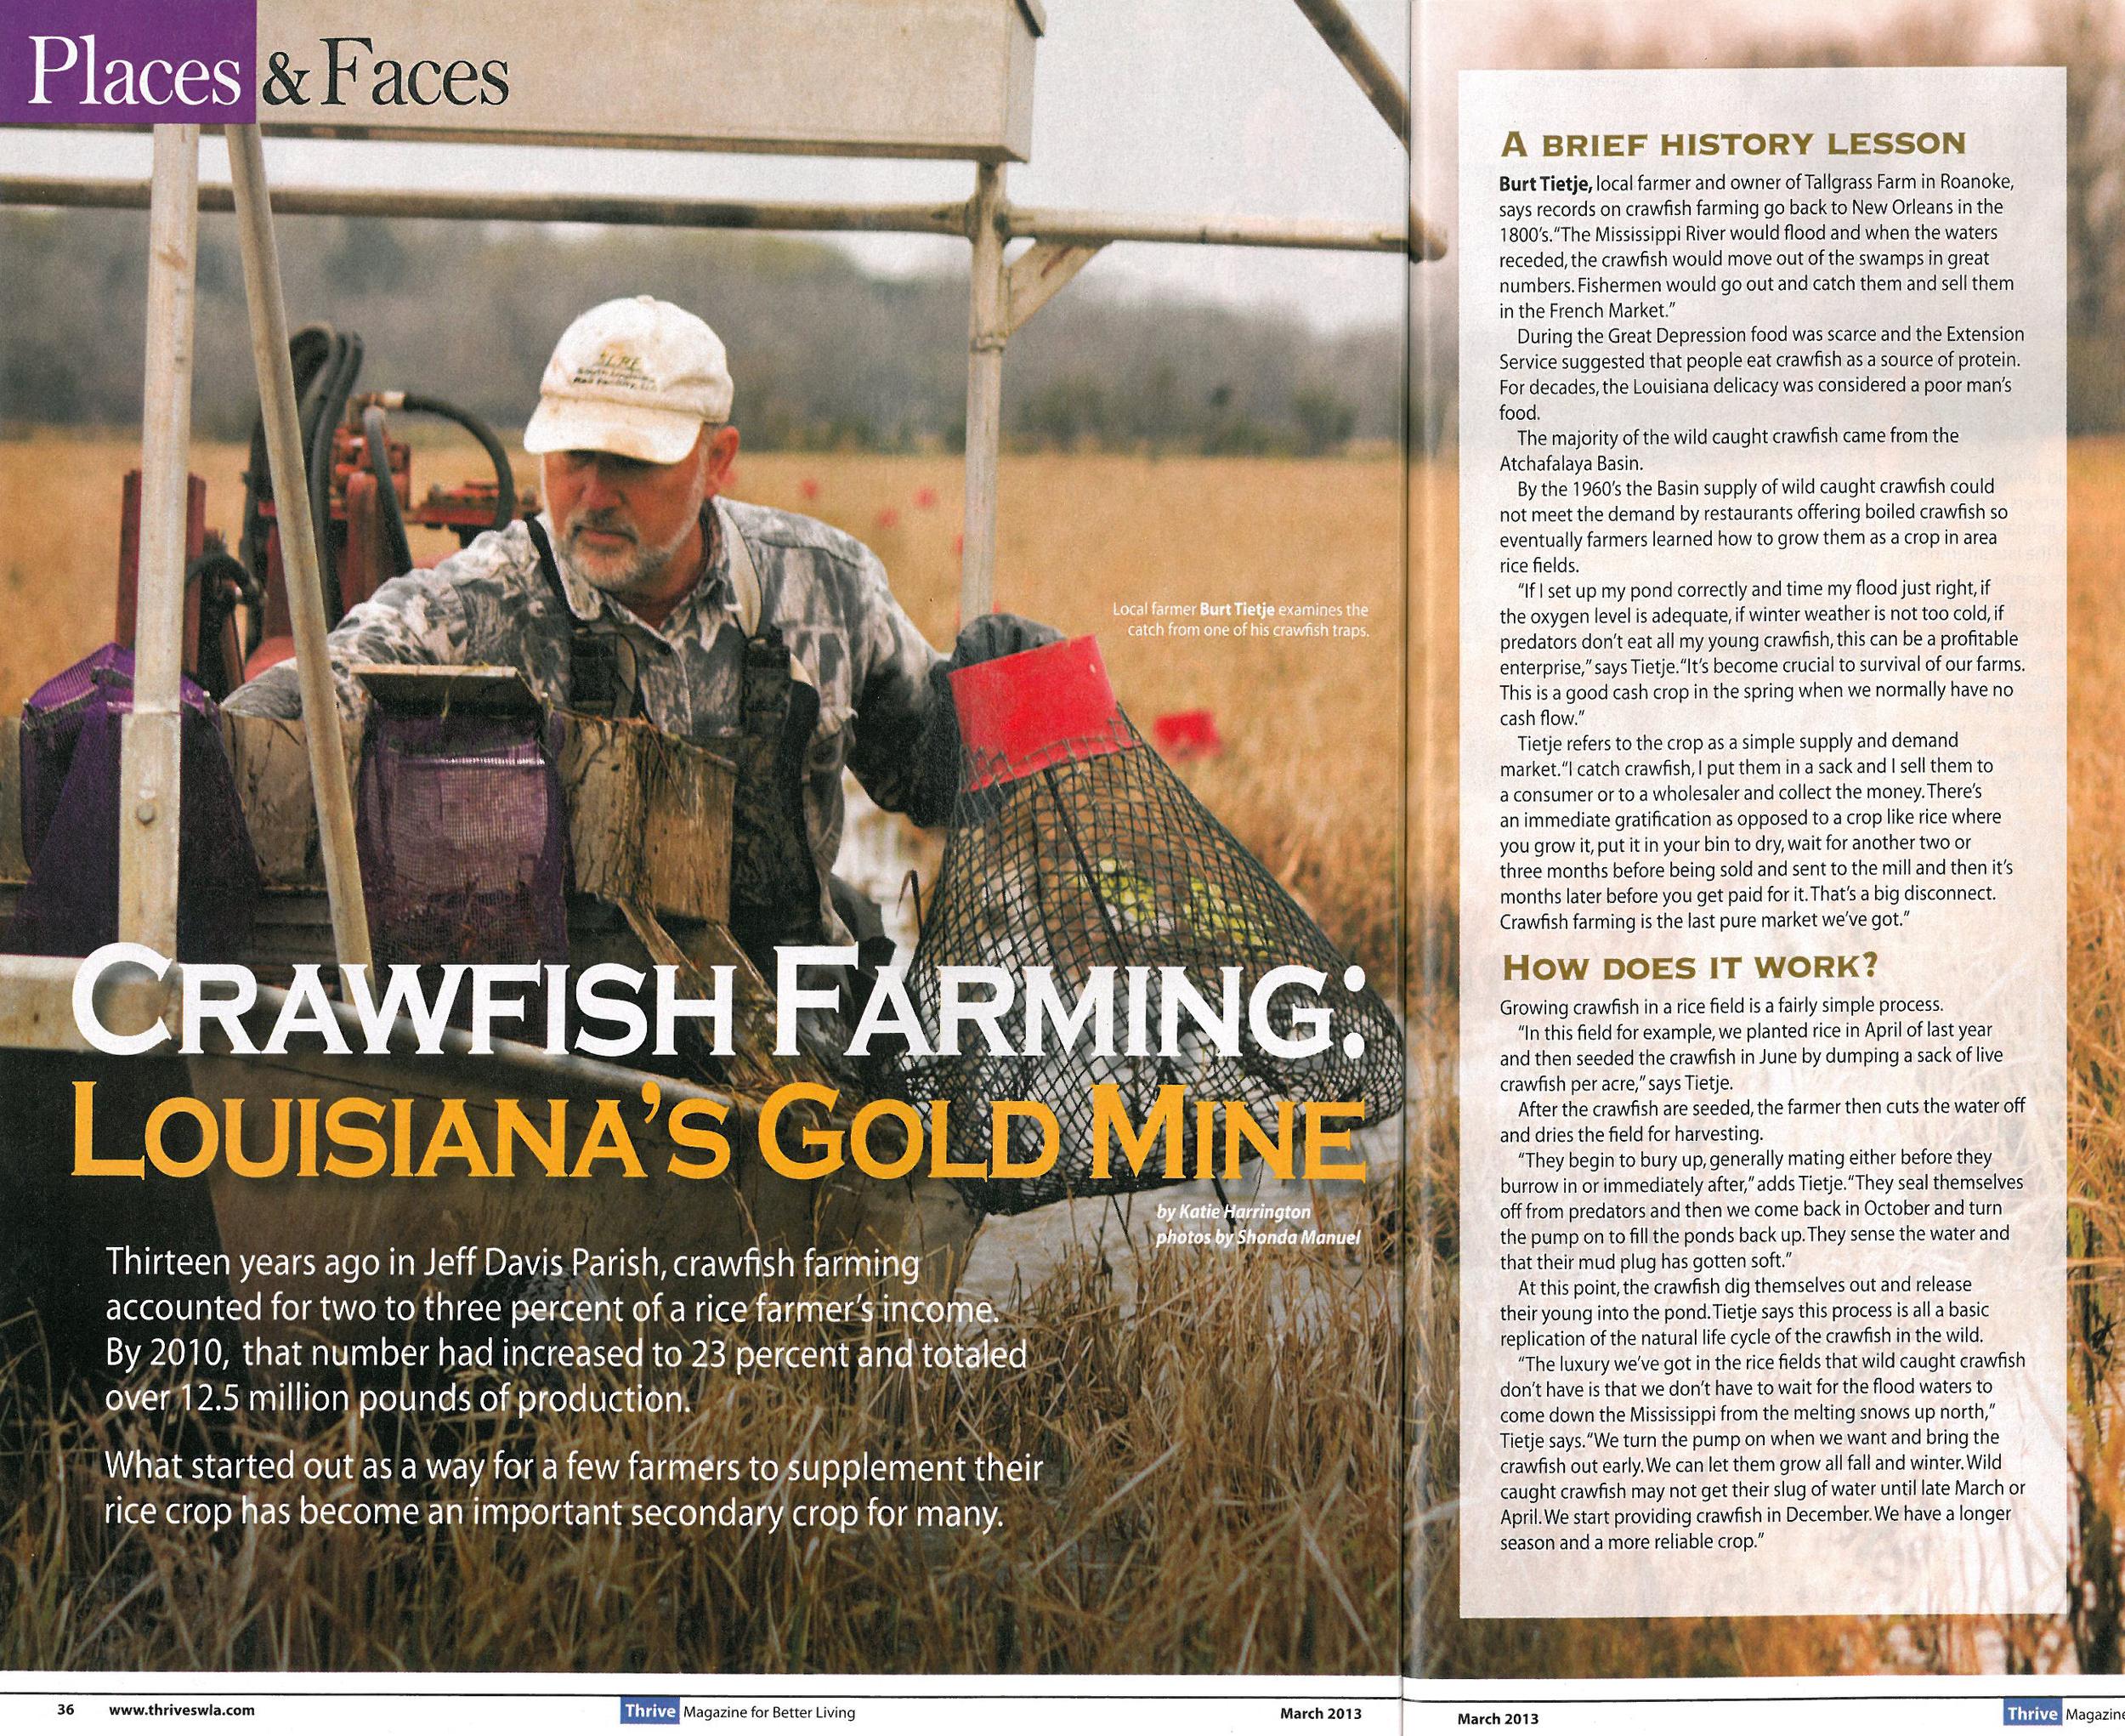 2013.03.28_Thrive_Crawfish Article 02.jpg